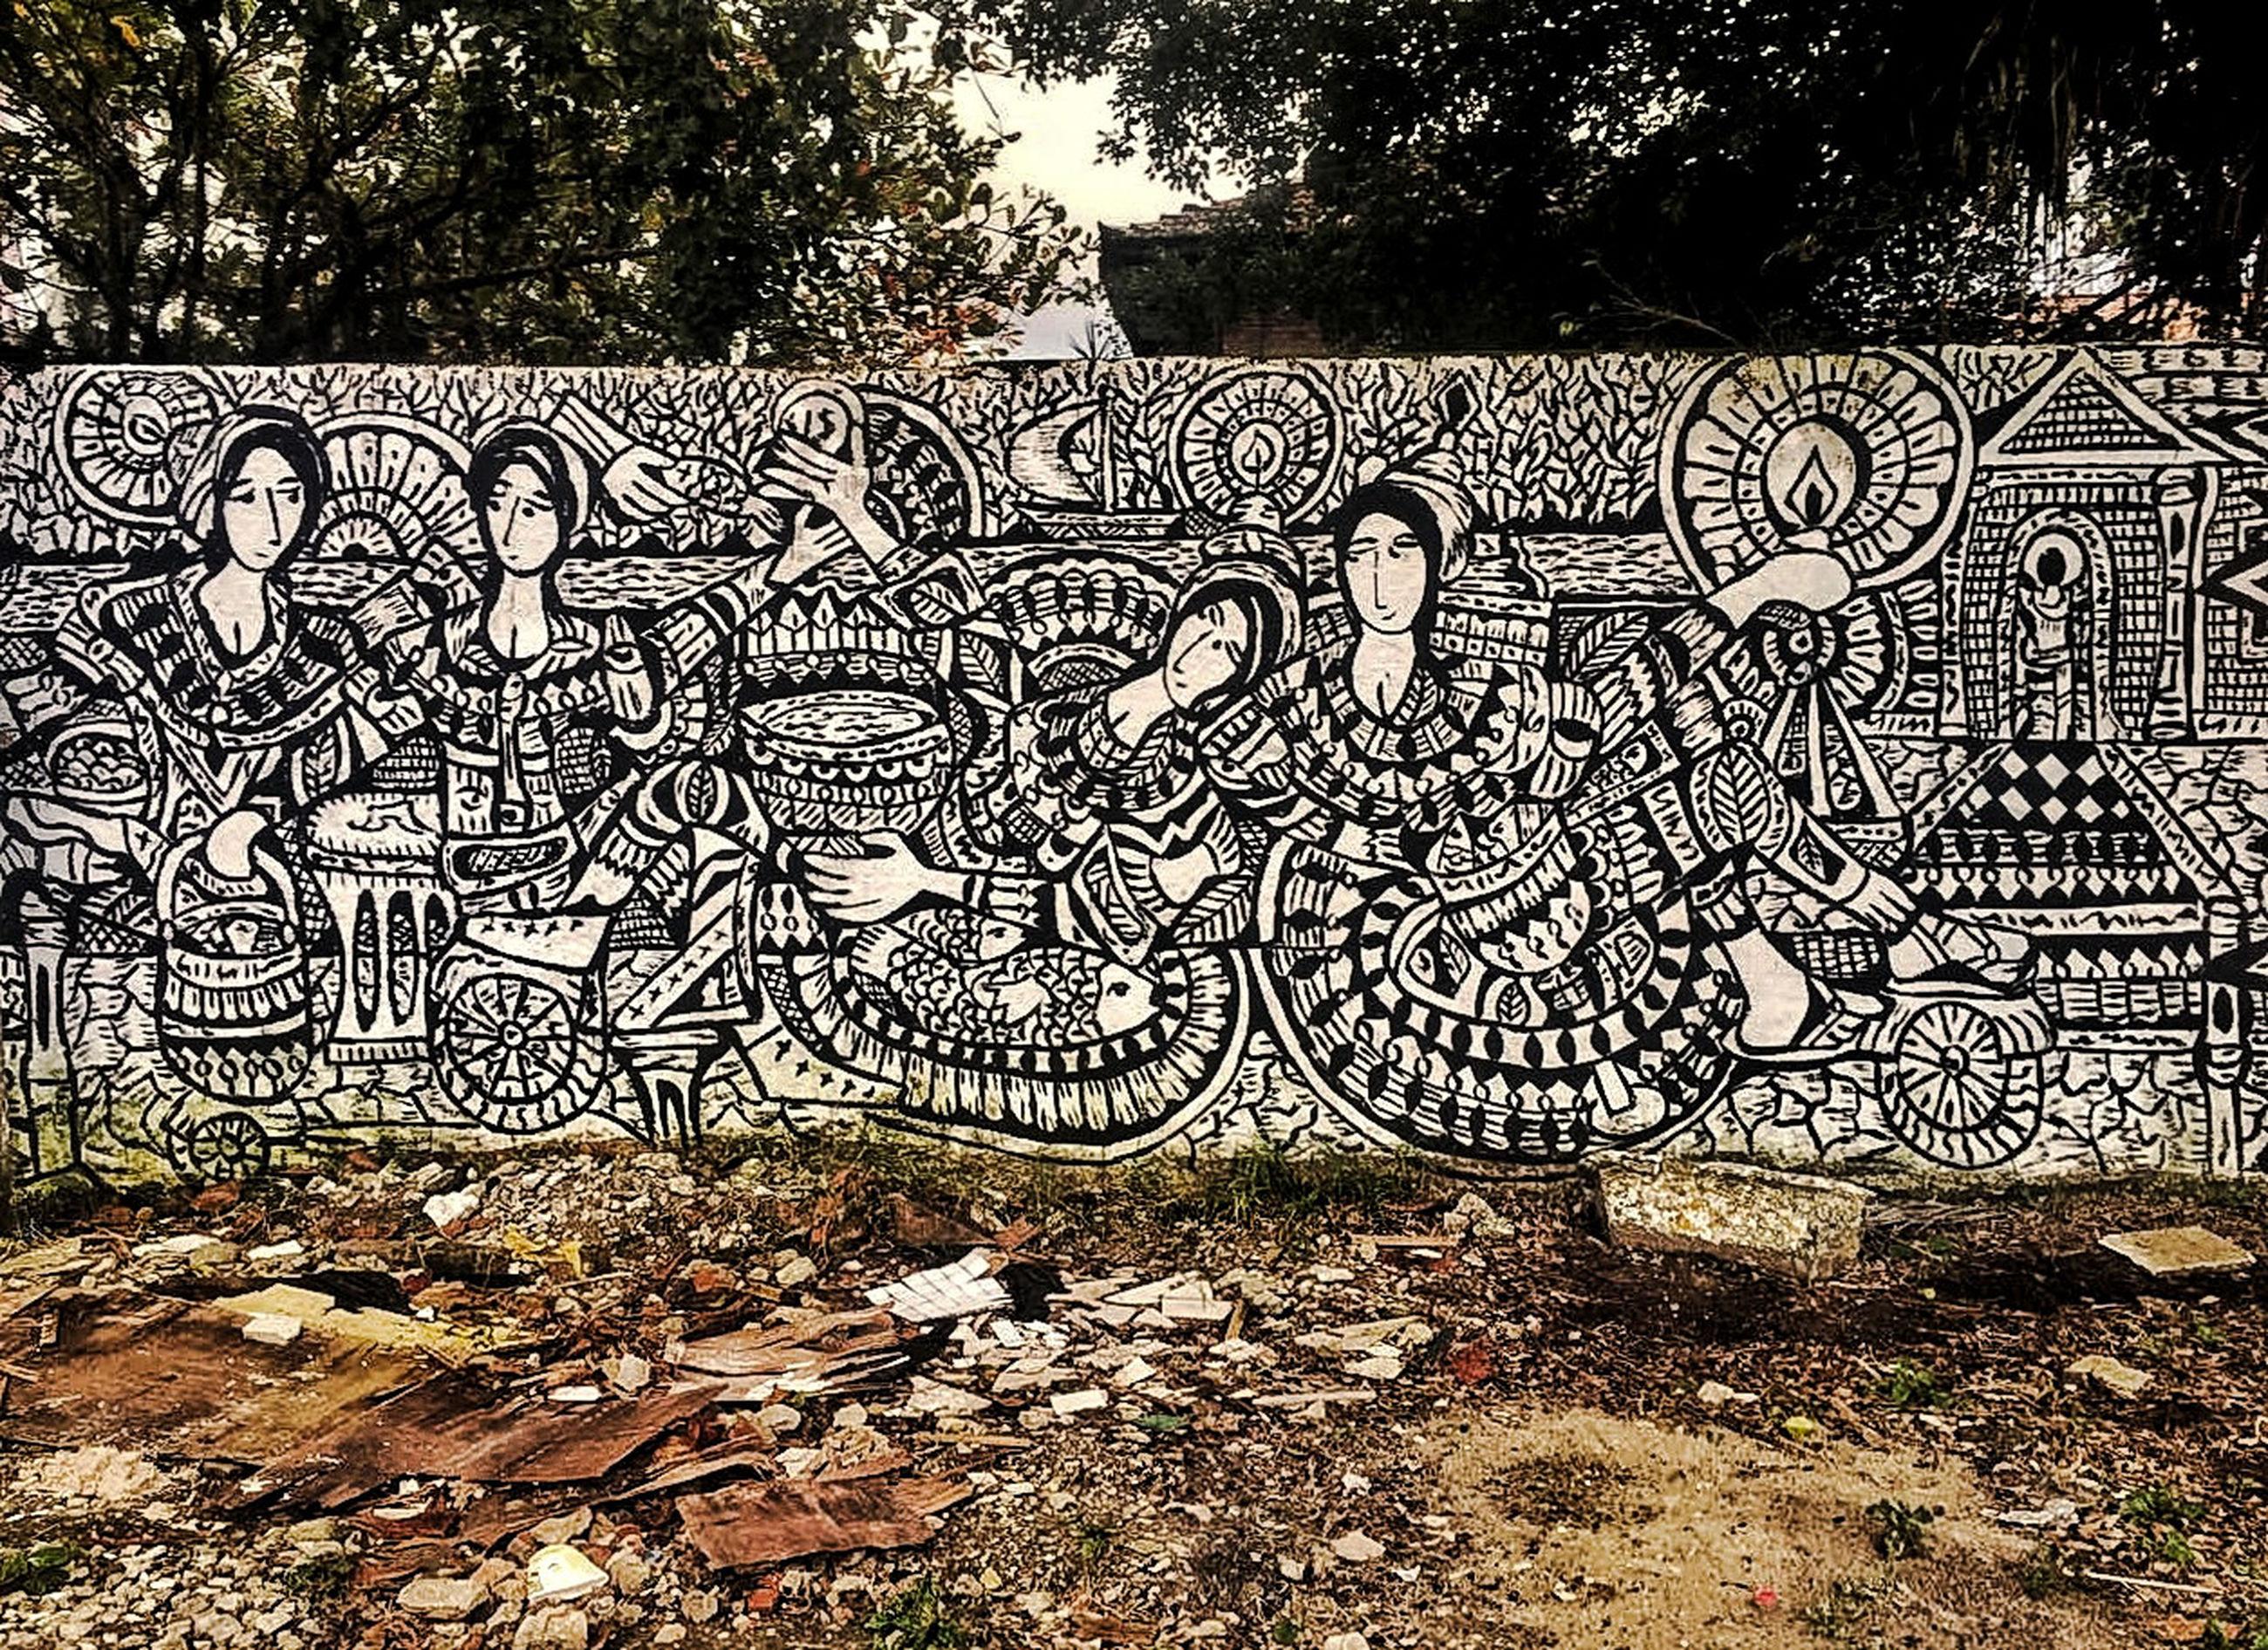 graffiti, creativity, art and craft, tree, day, outdoors, no people, architecture, nature